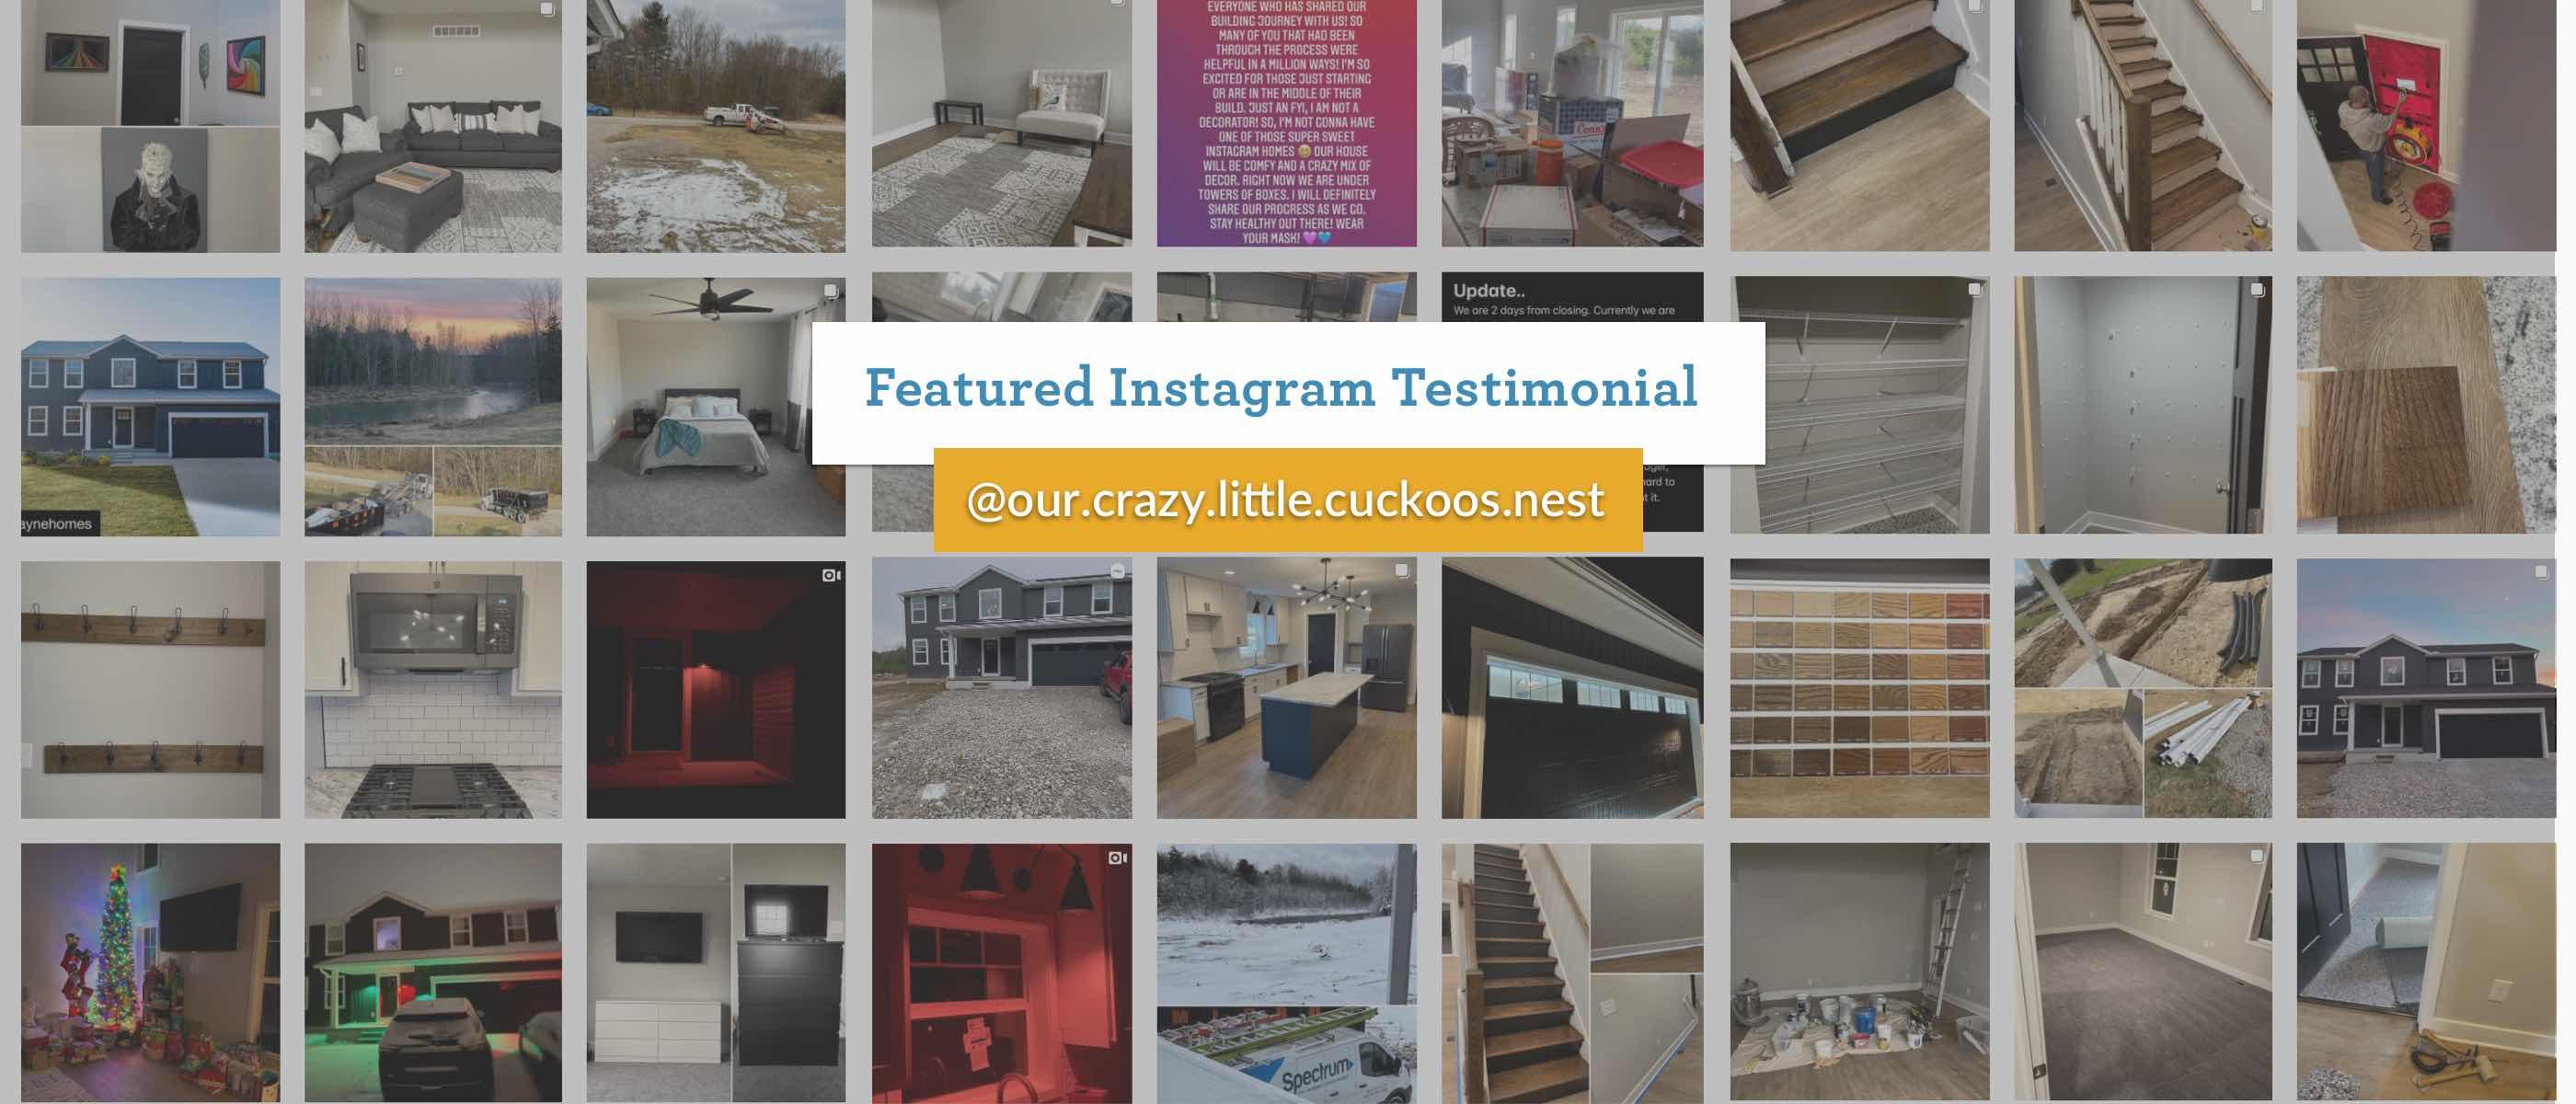 BW_Blog_Featured Testimonial - our.crazy.little.cuckoos.nest